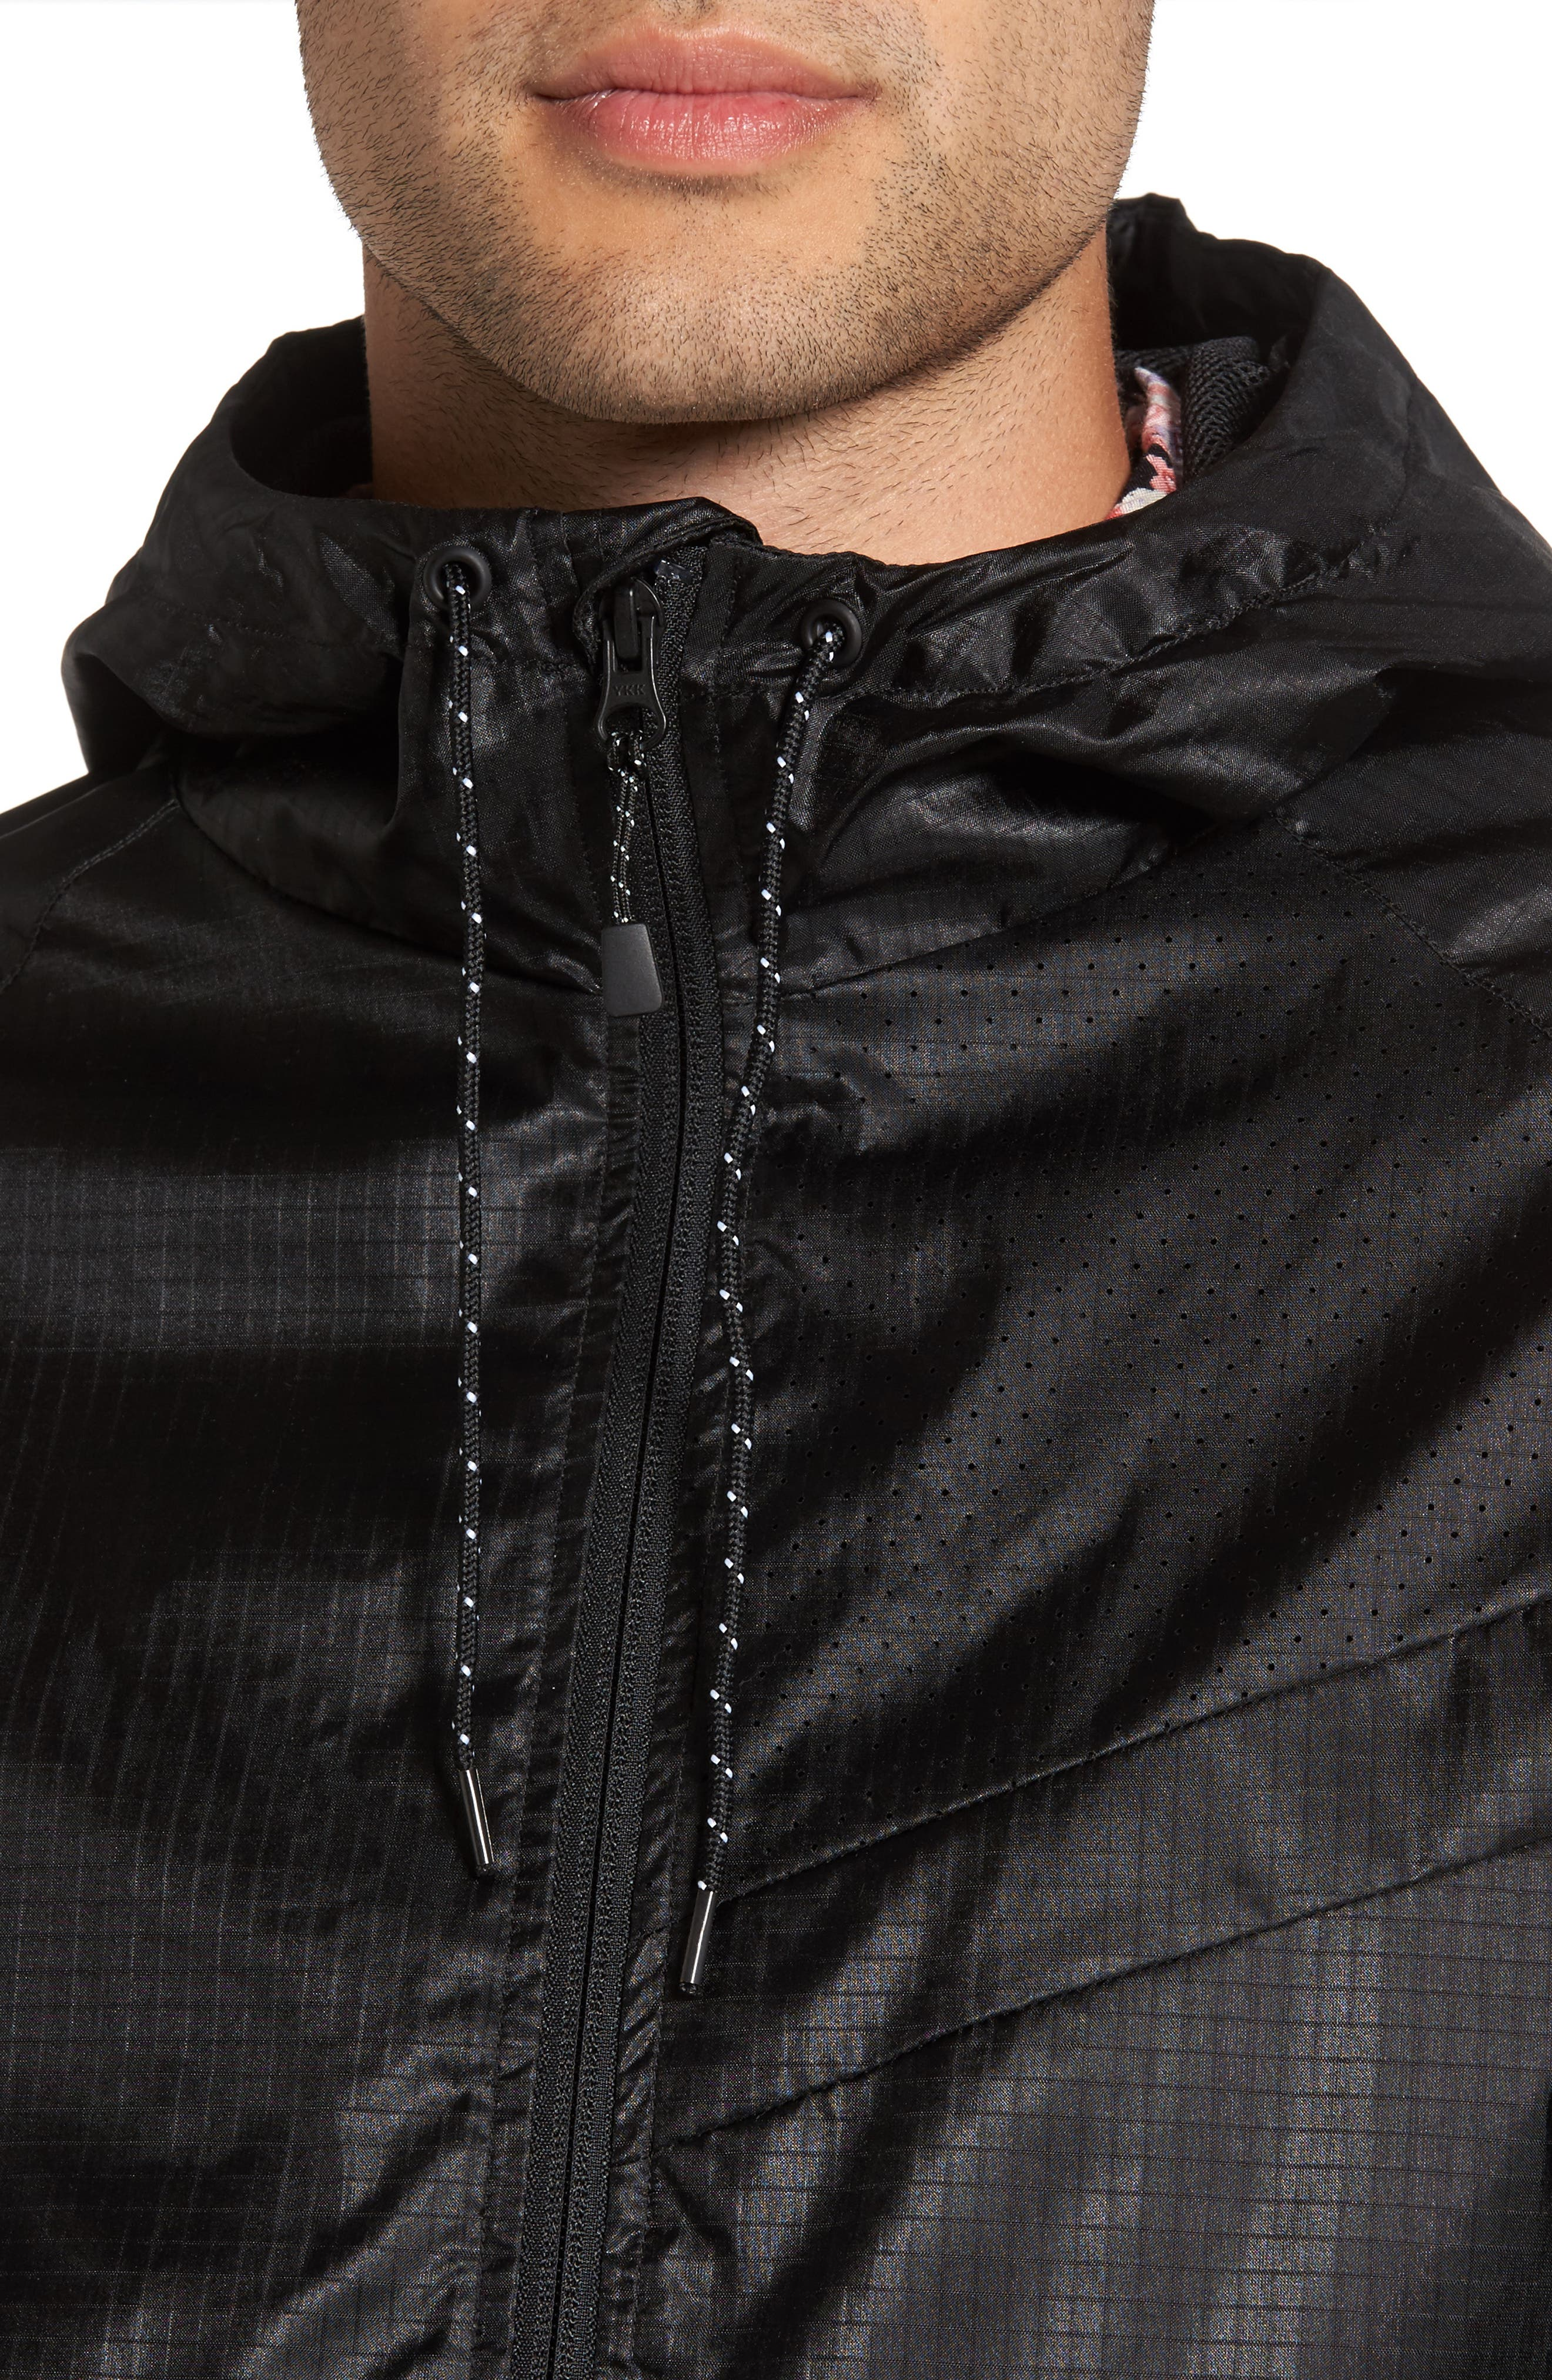 NCT Welder Jacket,                             Alternate thumbnail 4, color,                             001